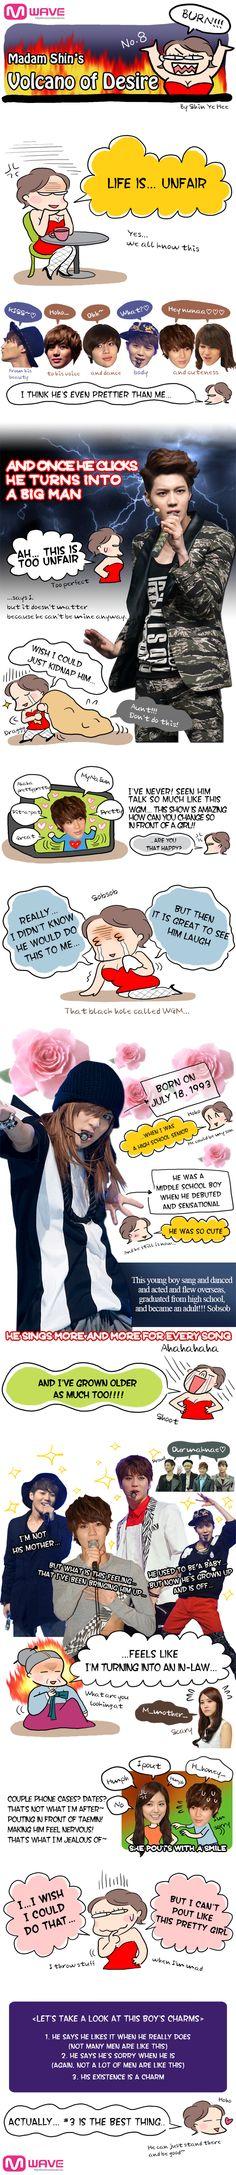 http://mwave.interest.me/mcartoon/view.m?seq=8 Madam Shin's Volcano of Desire - TaeMin | Mwave Hilarious comic expressing an admiration to the maknae